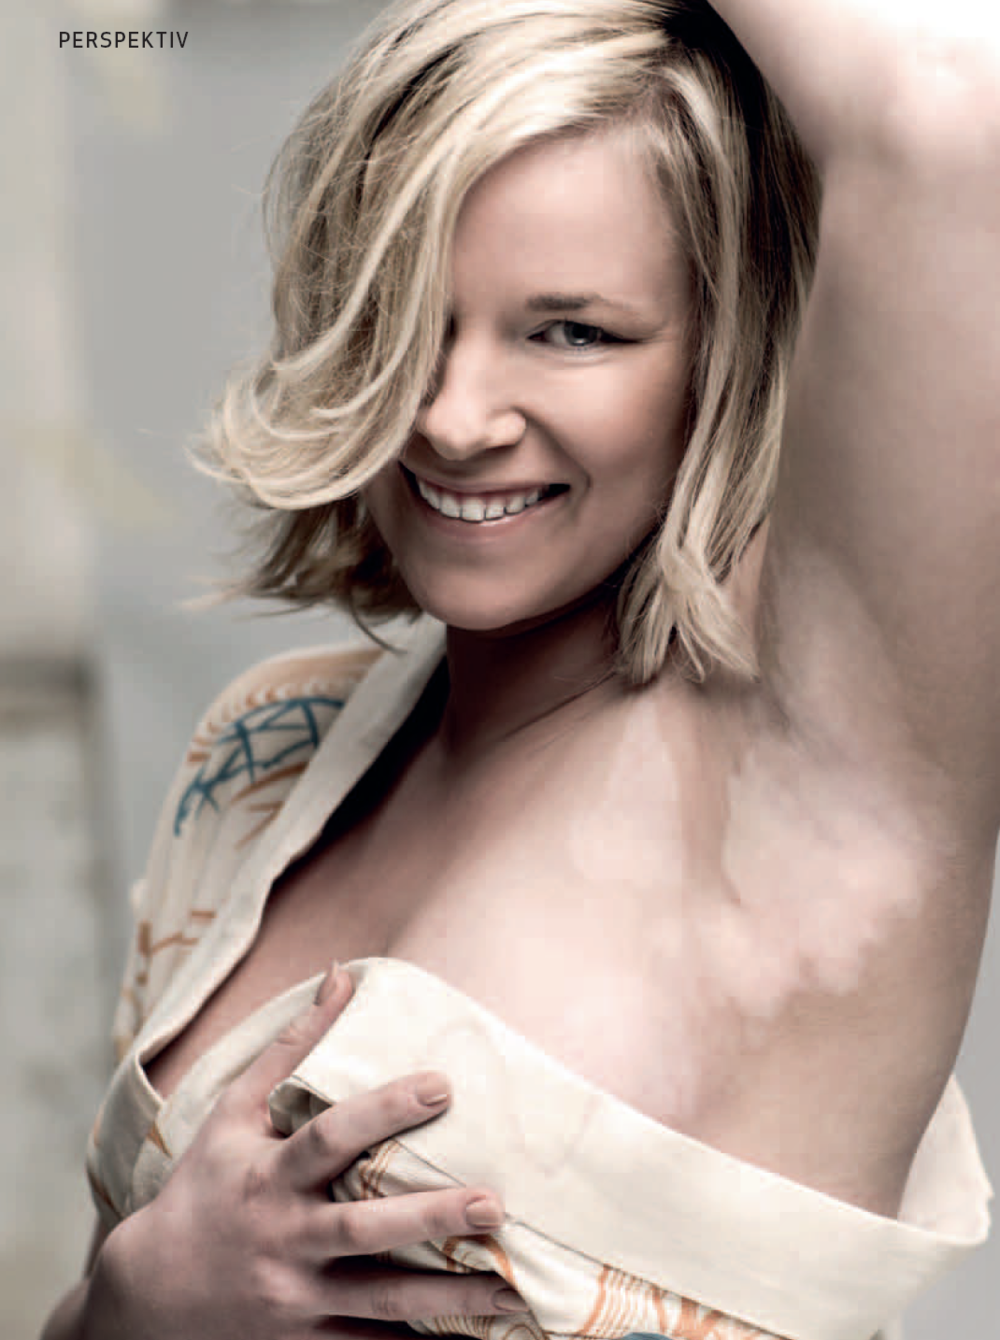 Fra artiklen 'Mig og min krop' som jeg skrev for Femina, med 7 modige kvinder.